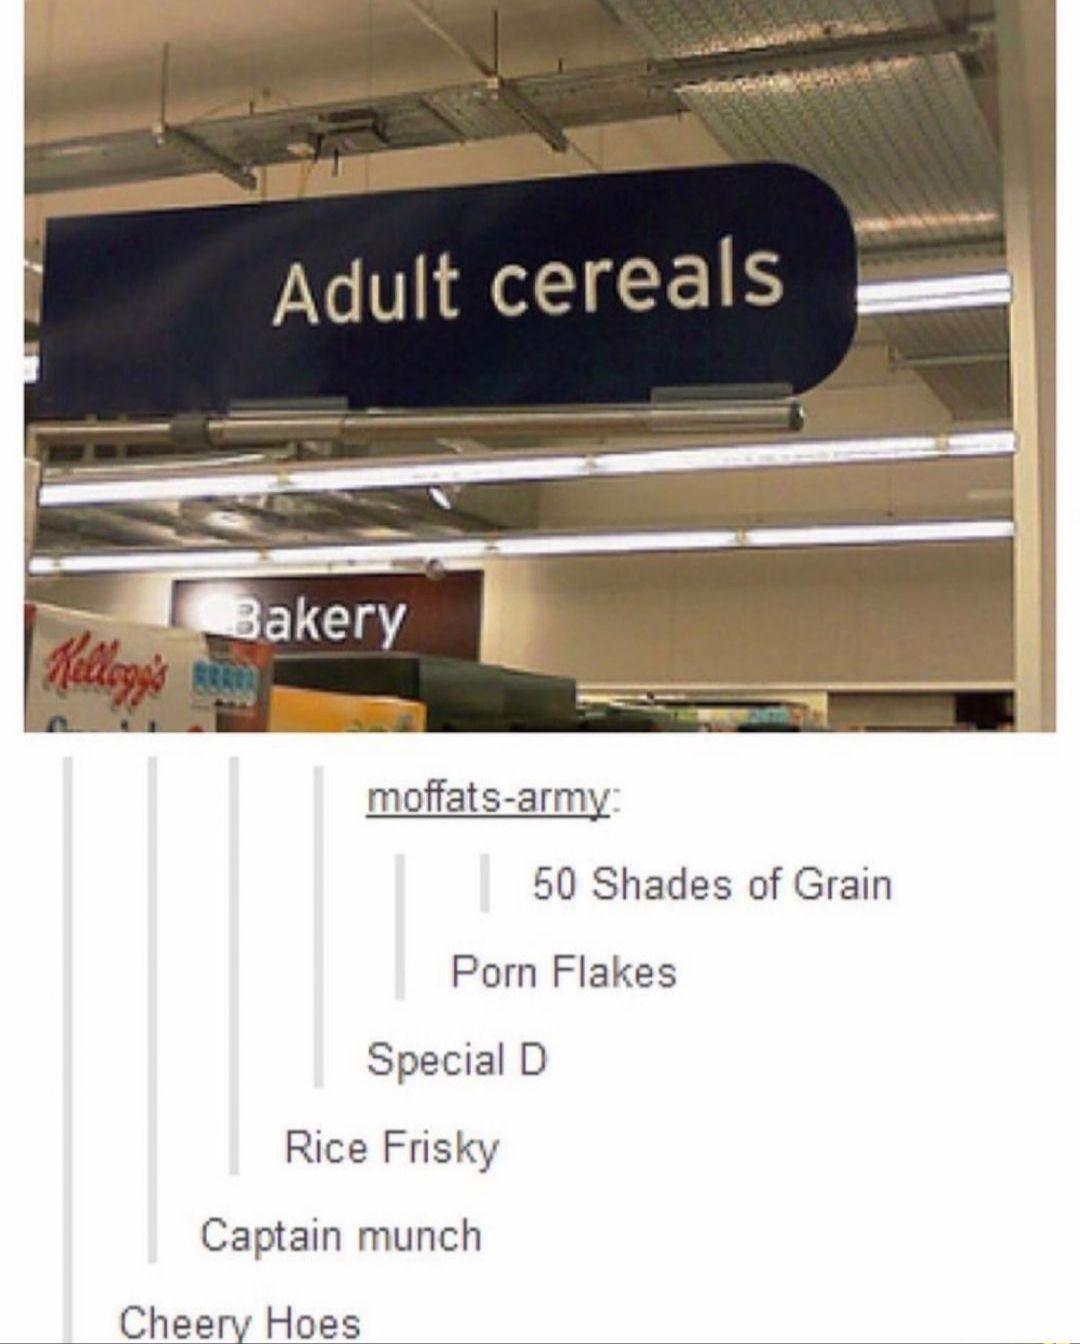 Fruity holes